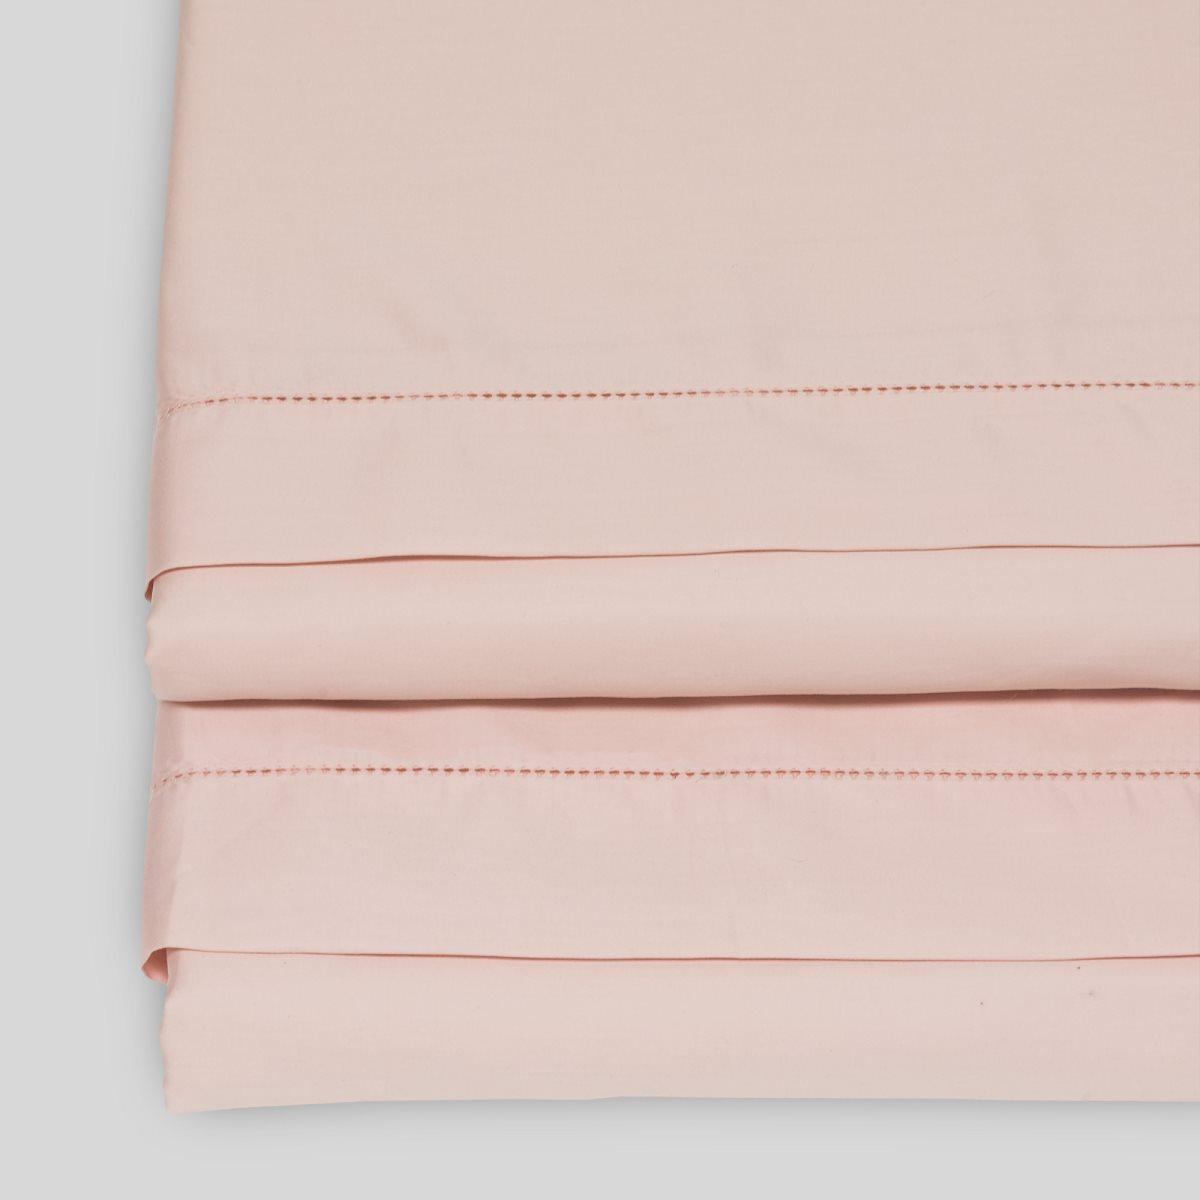 cream flat sheet on floral bedding